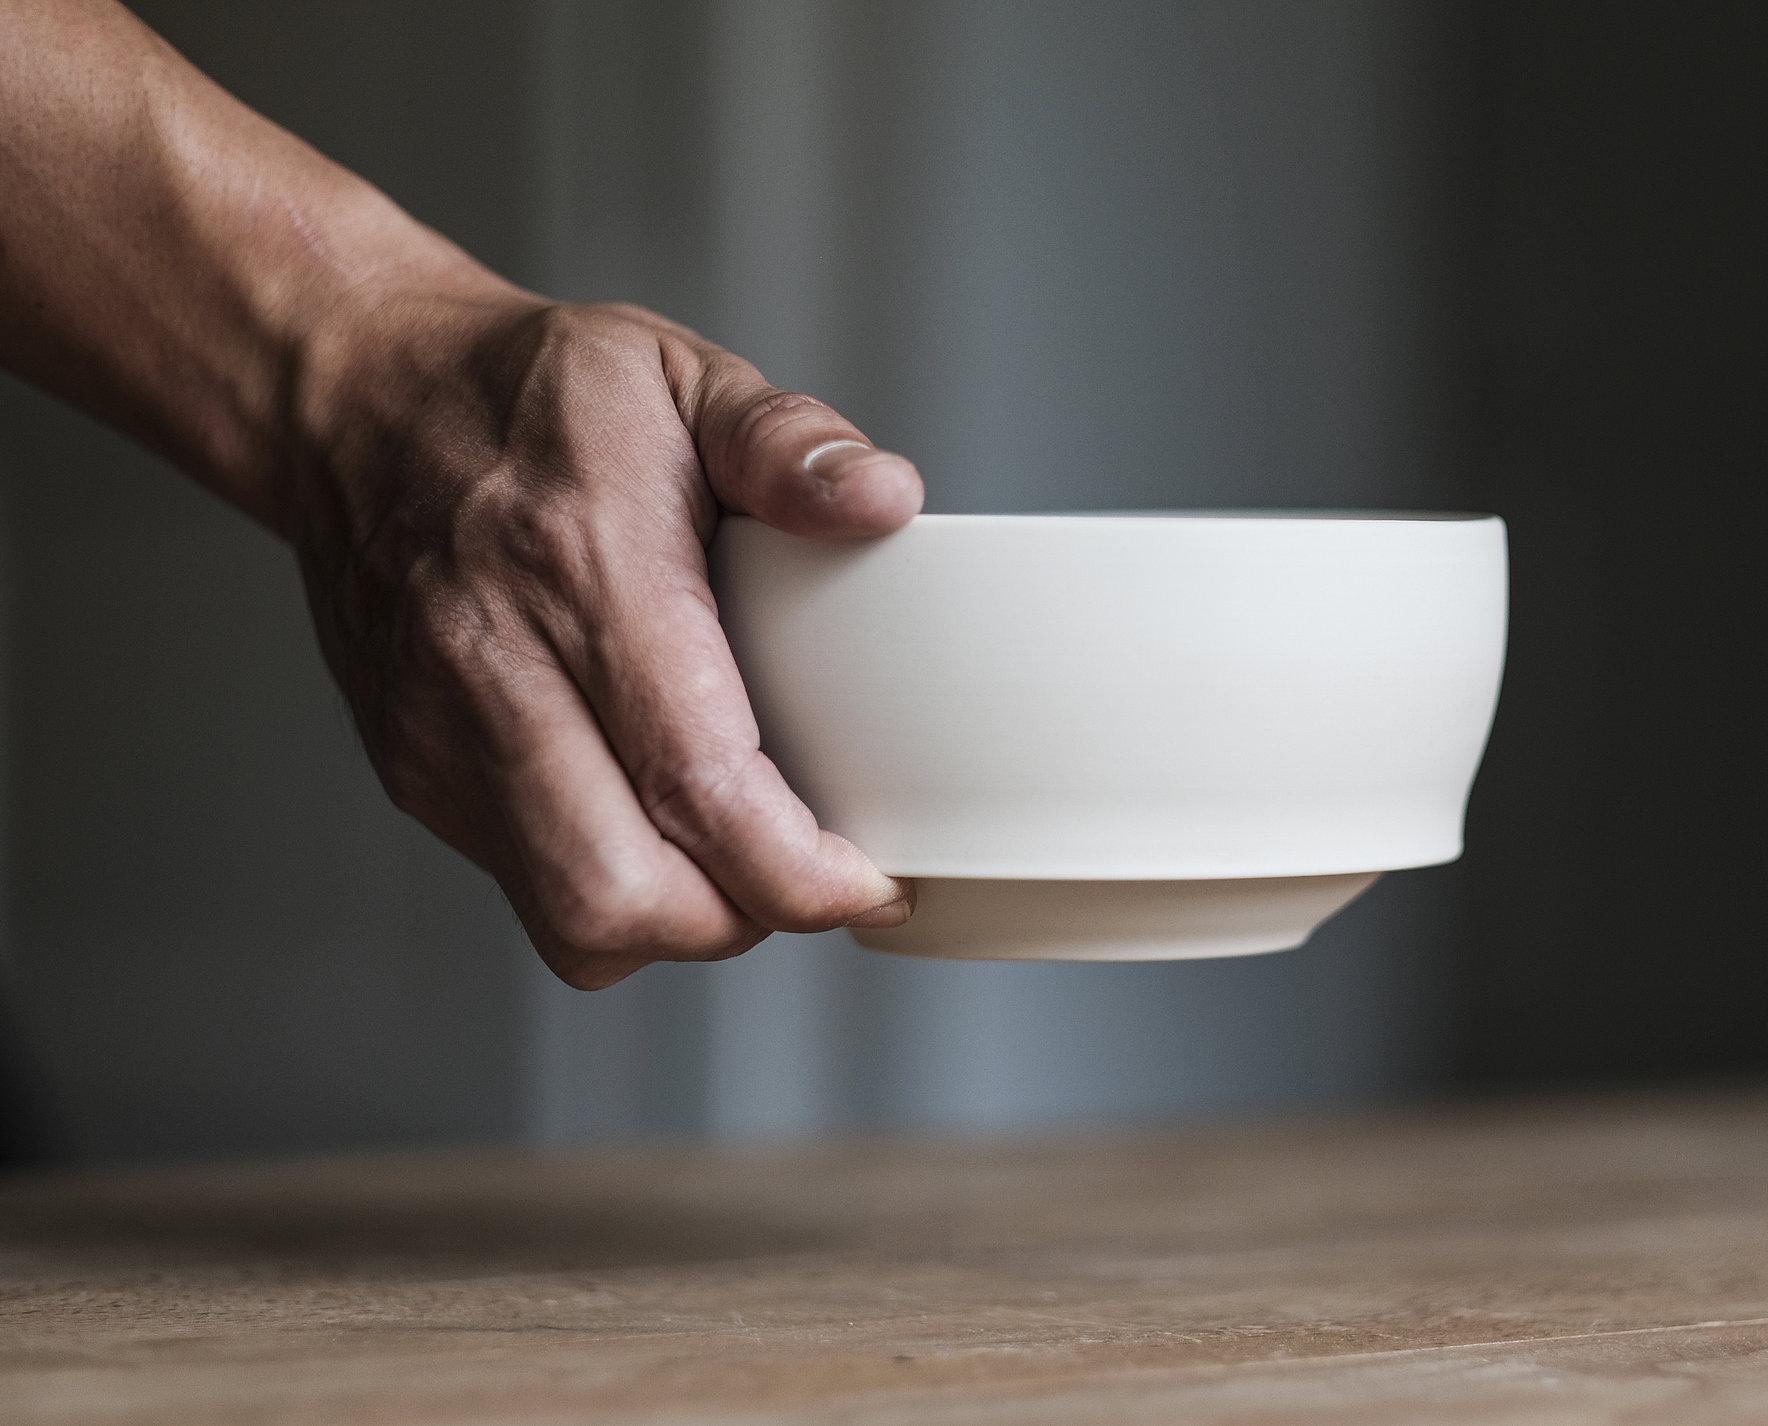 Waist Bowl - Intuitive Ergonomic Bowl | Red Dot Design Award